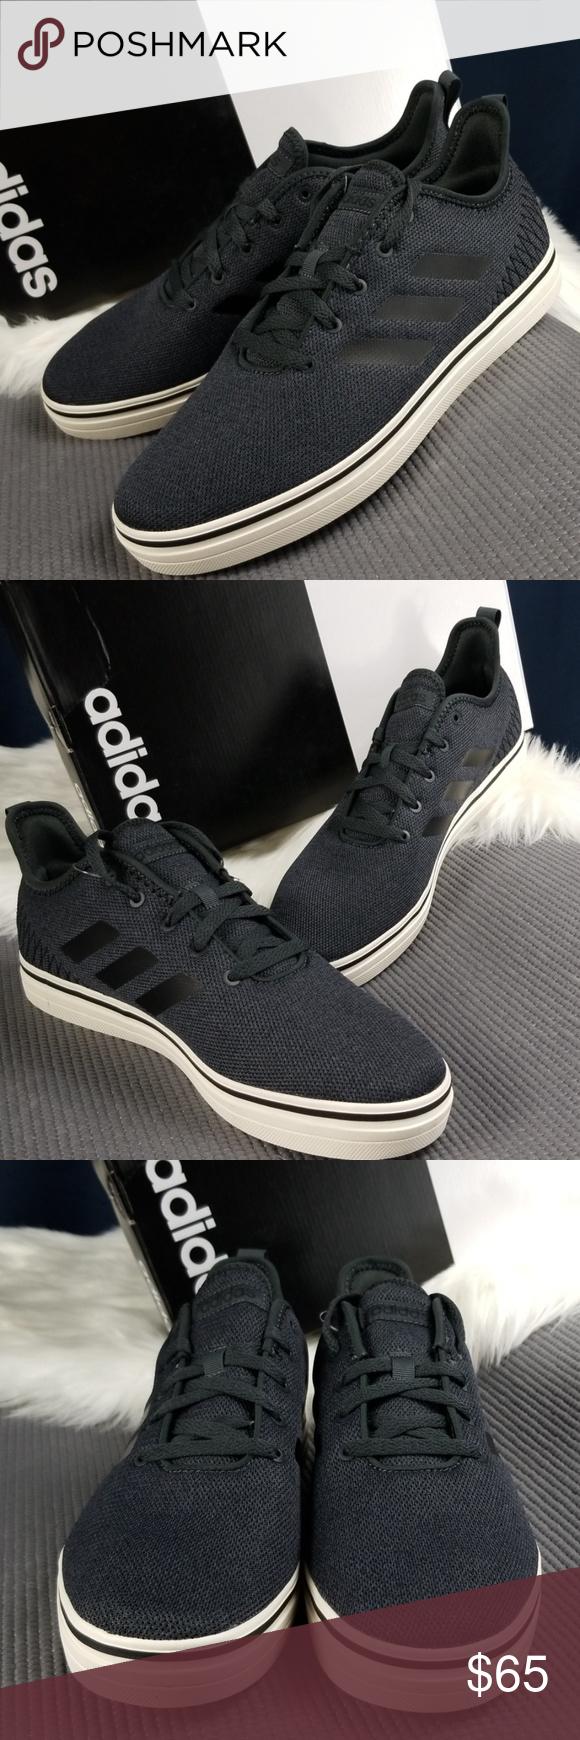 Adidas True Chill Skateboarding Shoe